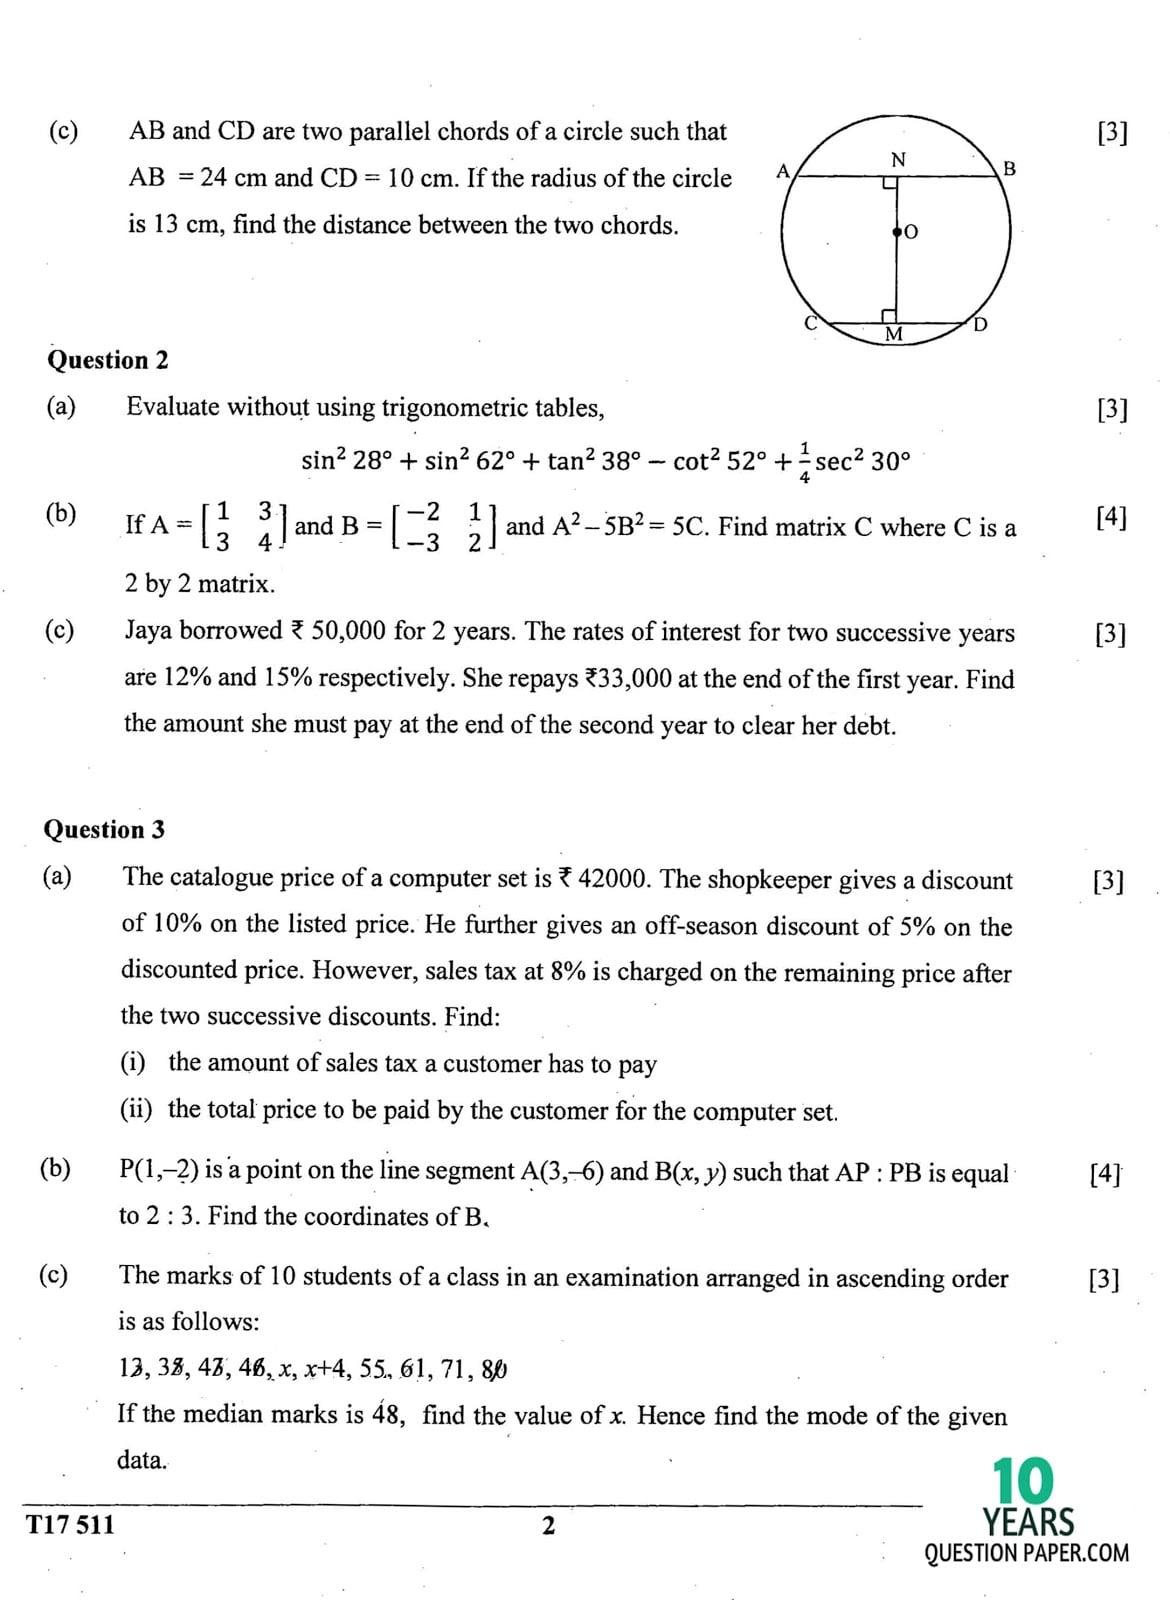 ICSE Class 10 Mathematics 2017 Question Paper